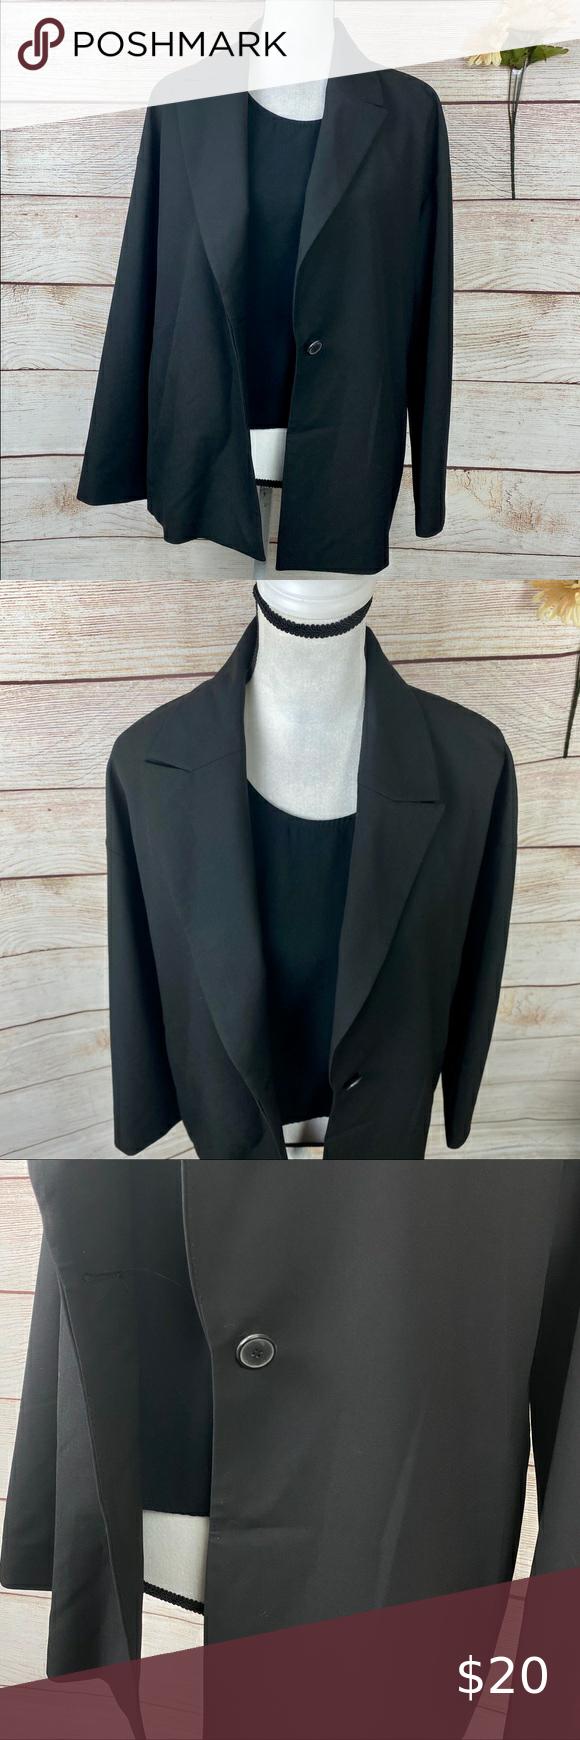 Zara Uniform Women S Black Blazer Suit Jacket Womens Black Blazer Black Blazer Blazer [ 1740 x 580 Pixel ]